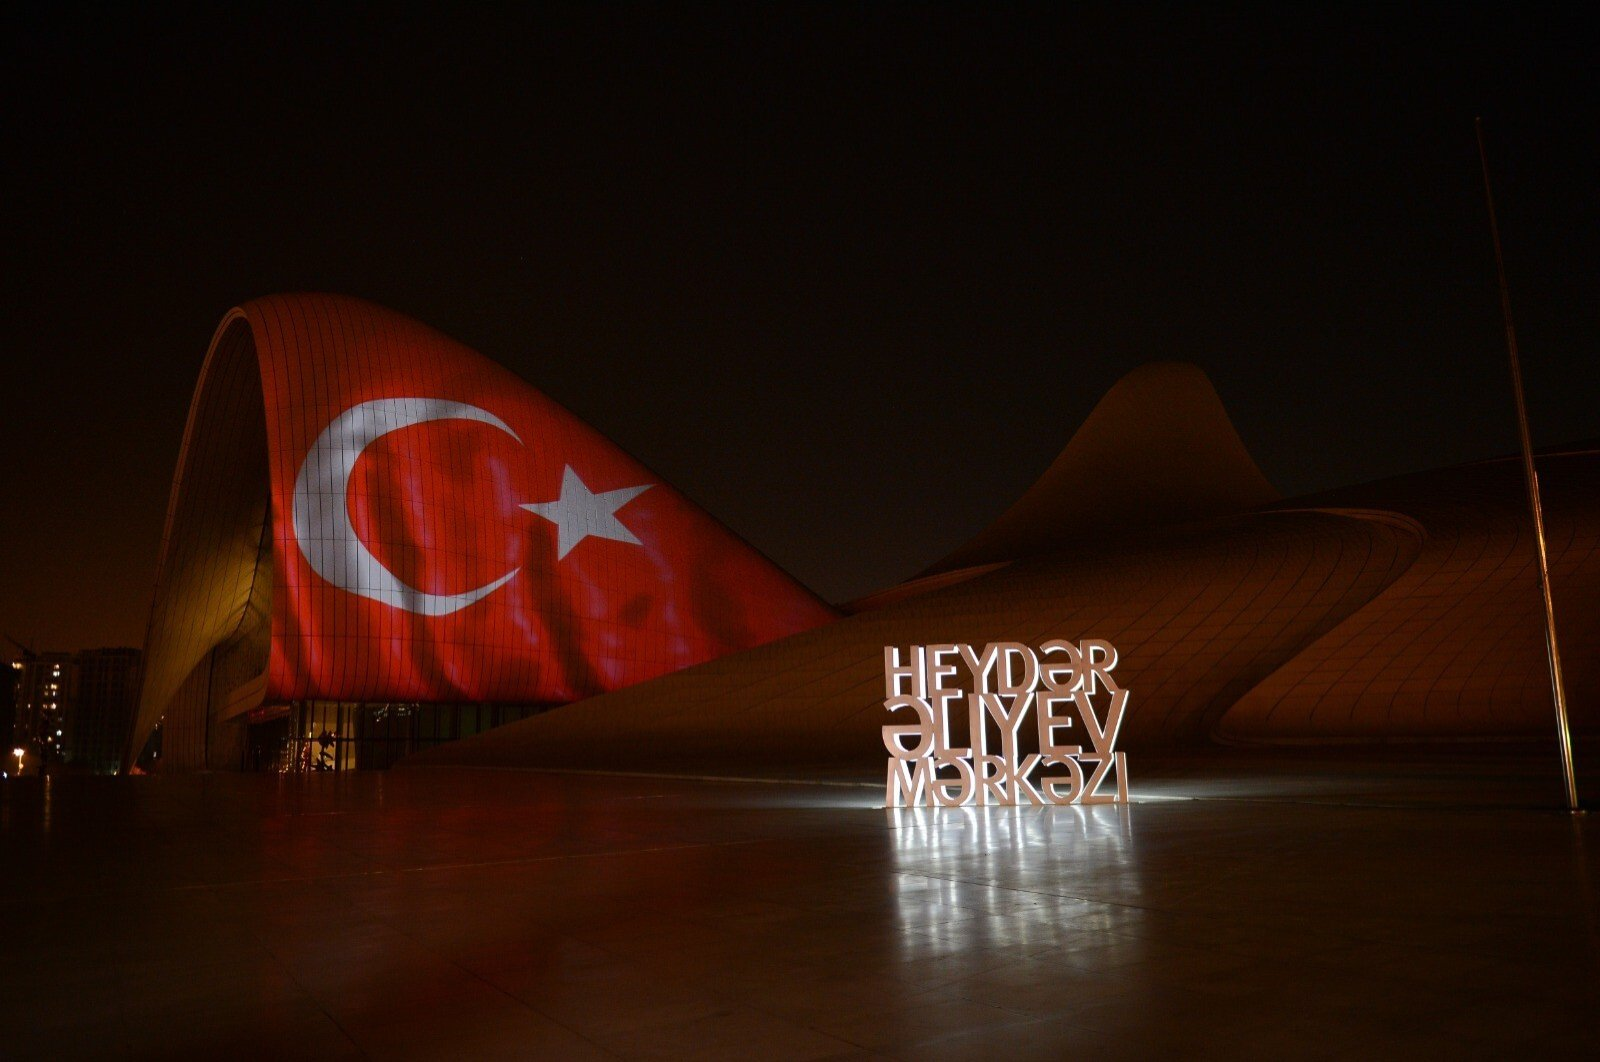 Image of Turkish flag reflected on the Heydar Aliyev Cultural Center in Azerbaijan's capital Baku on Saturday, April 11, 2020 (IHA Photo)